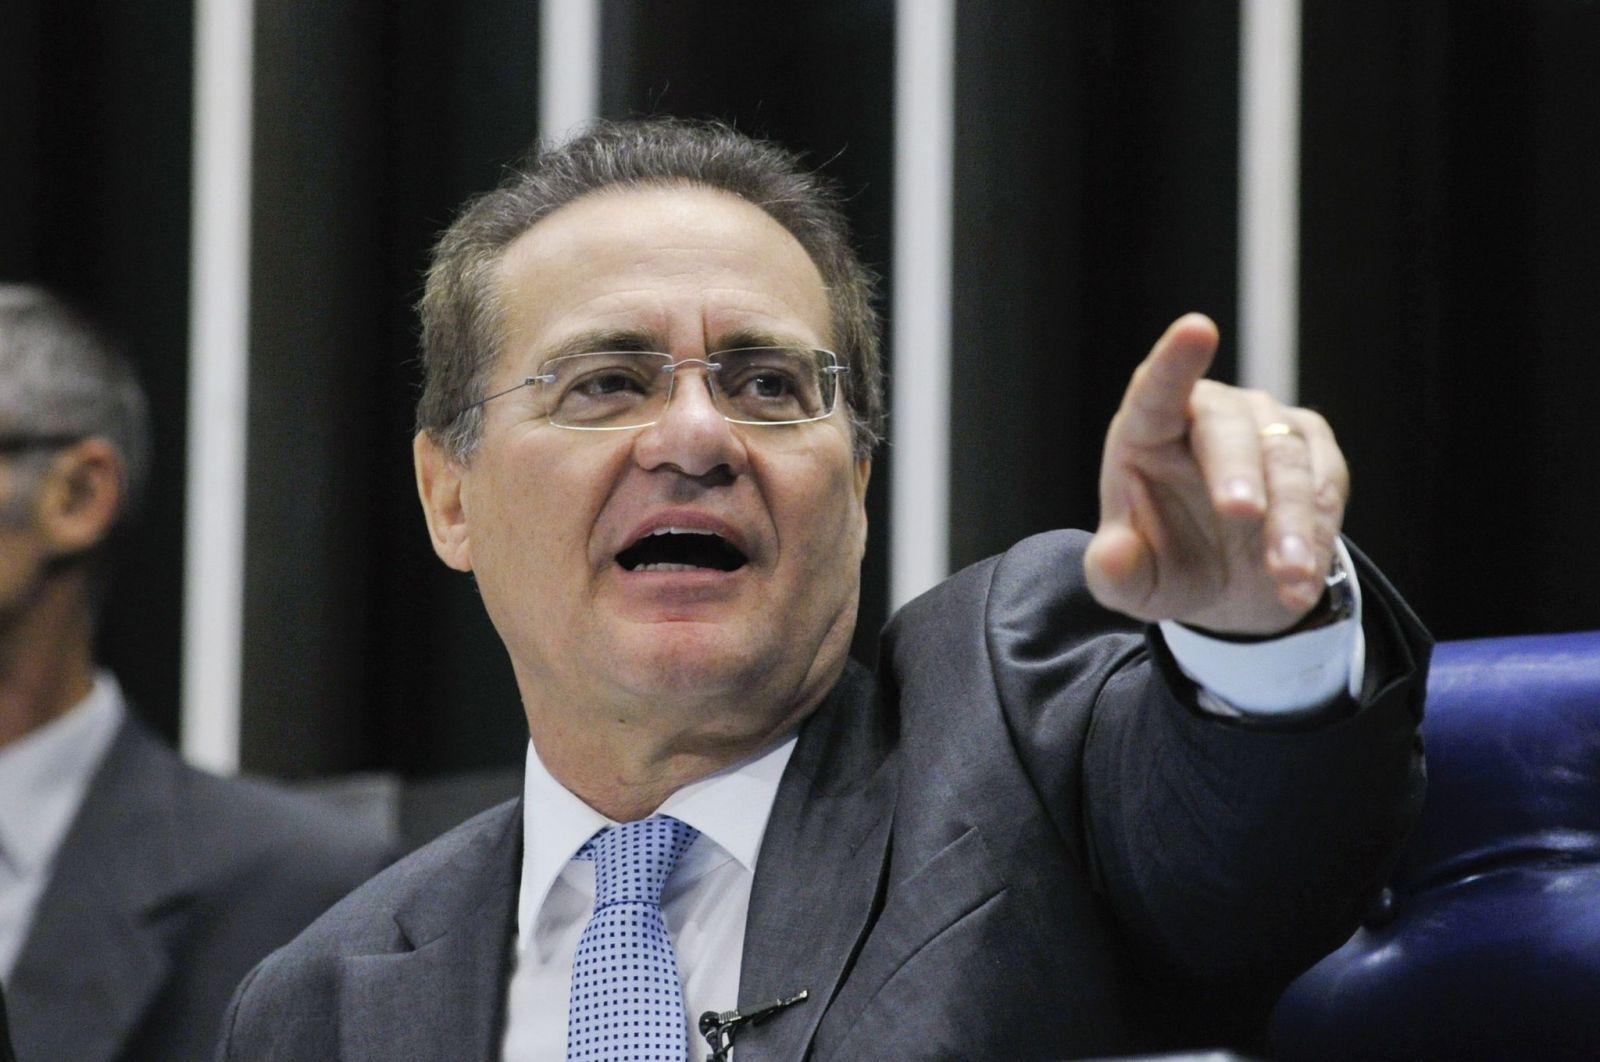 Renan: 'Nenhuma democracia merece isso'